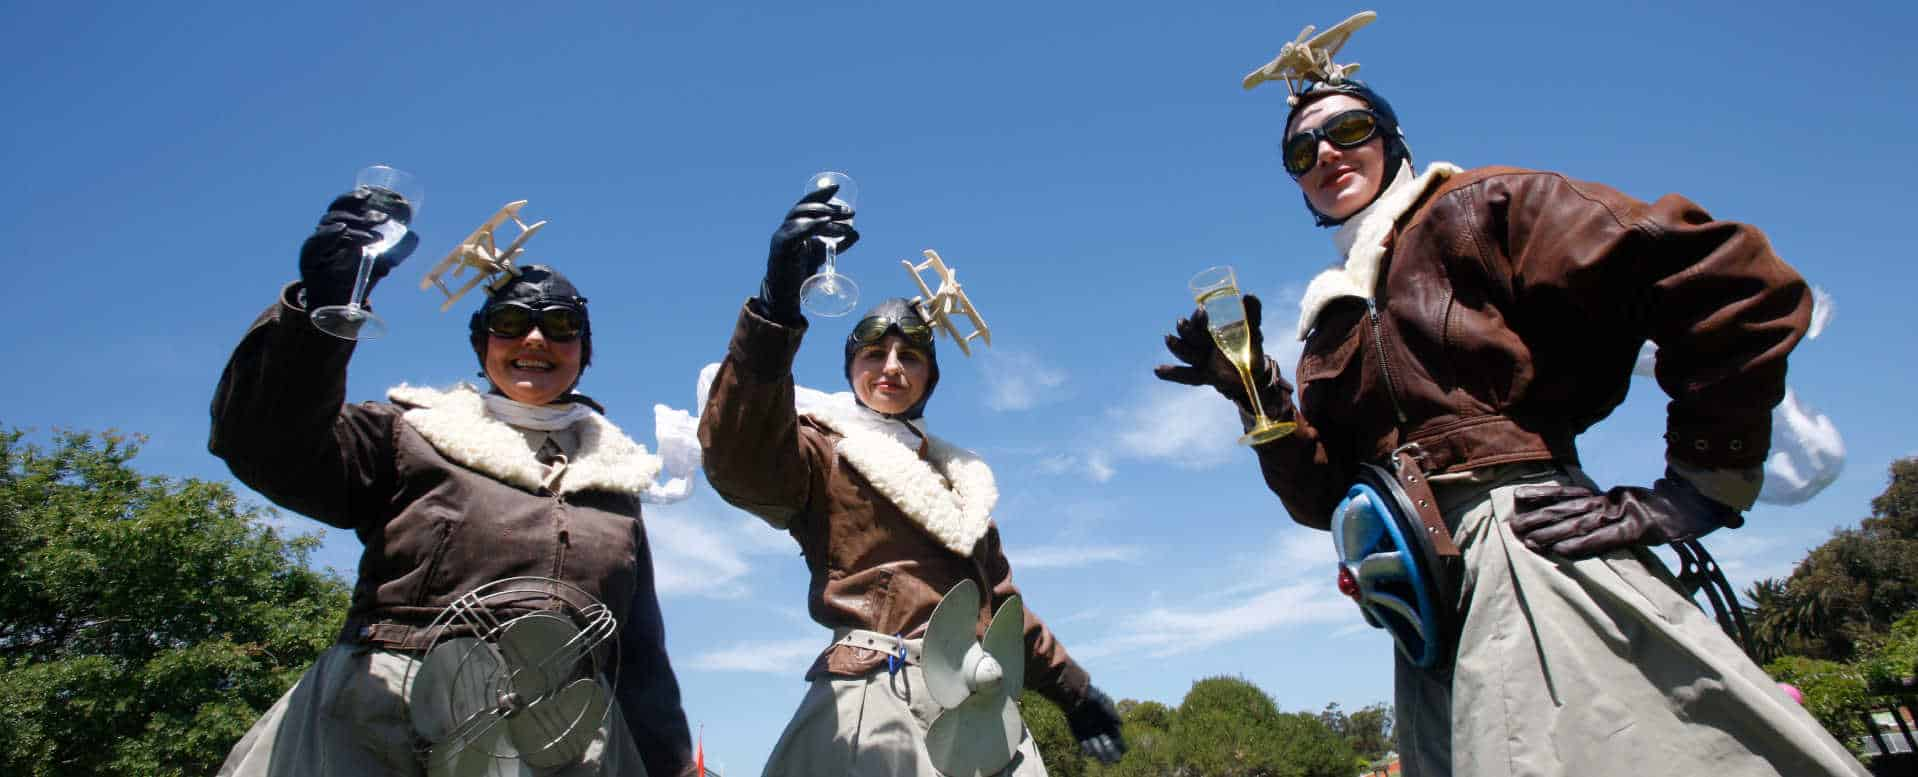 The Aviator Women stiltwalking at Viva la Gong - photo Bernie Fischer